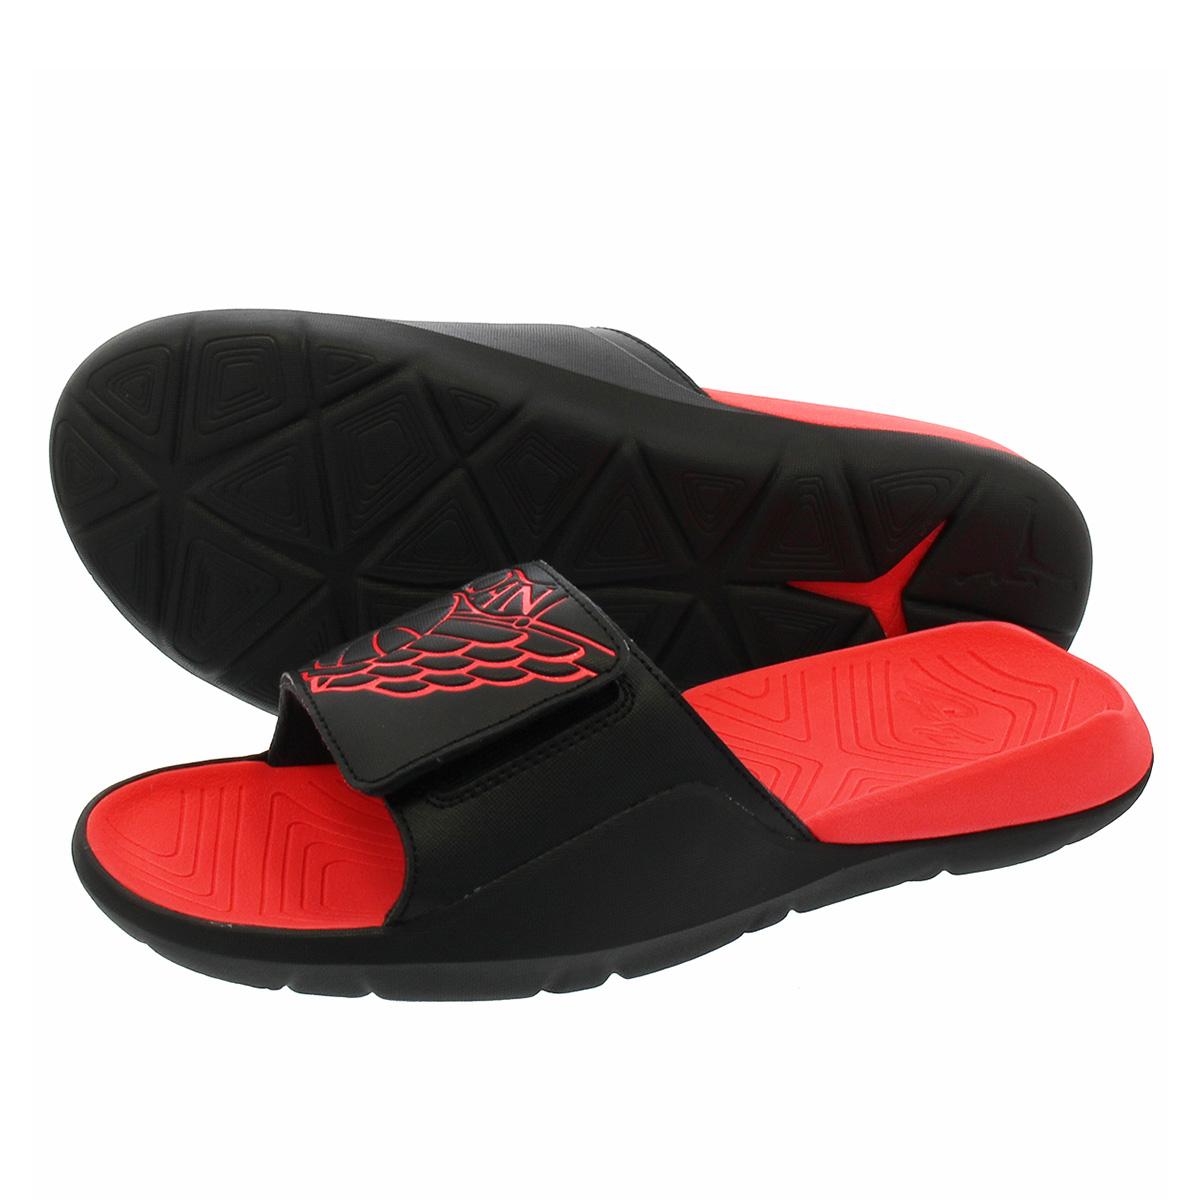 huge discount b5458 304dc NIKE JORDAN HYDRO 7 Nike Jordan high mud 7 BLACK INFRARED 23